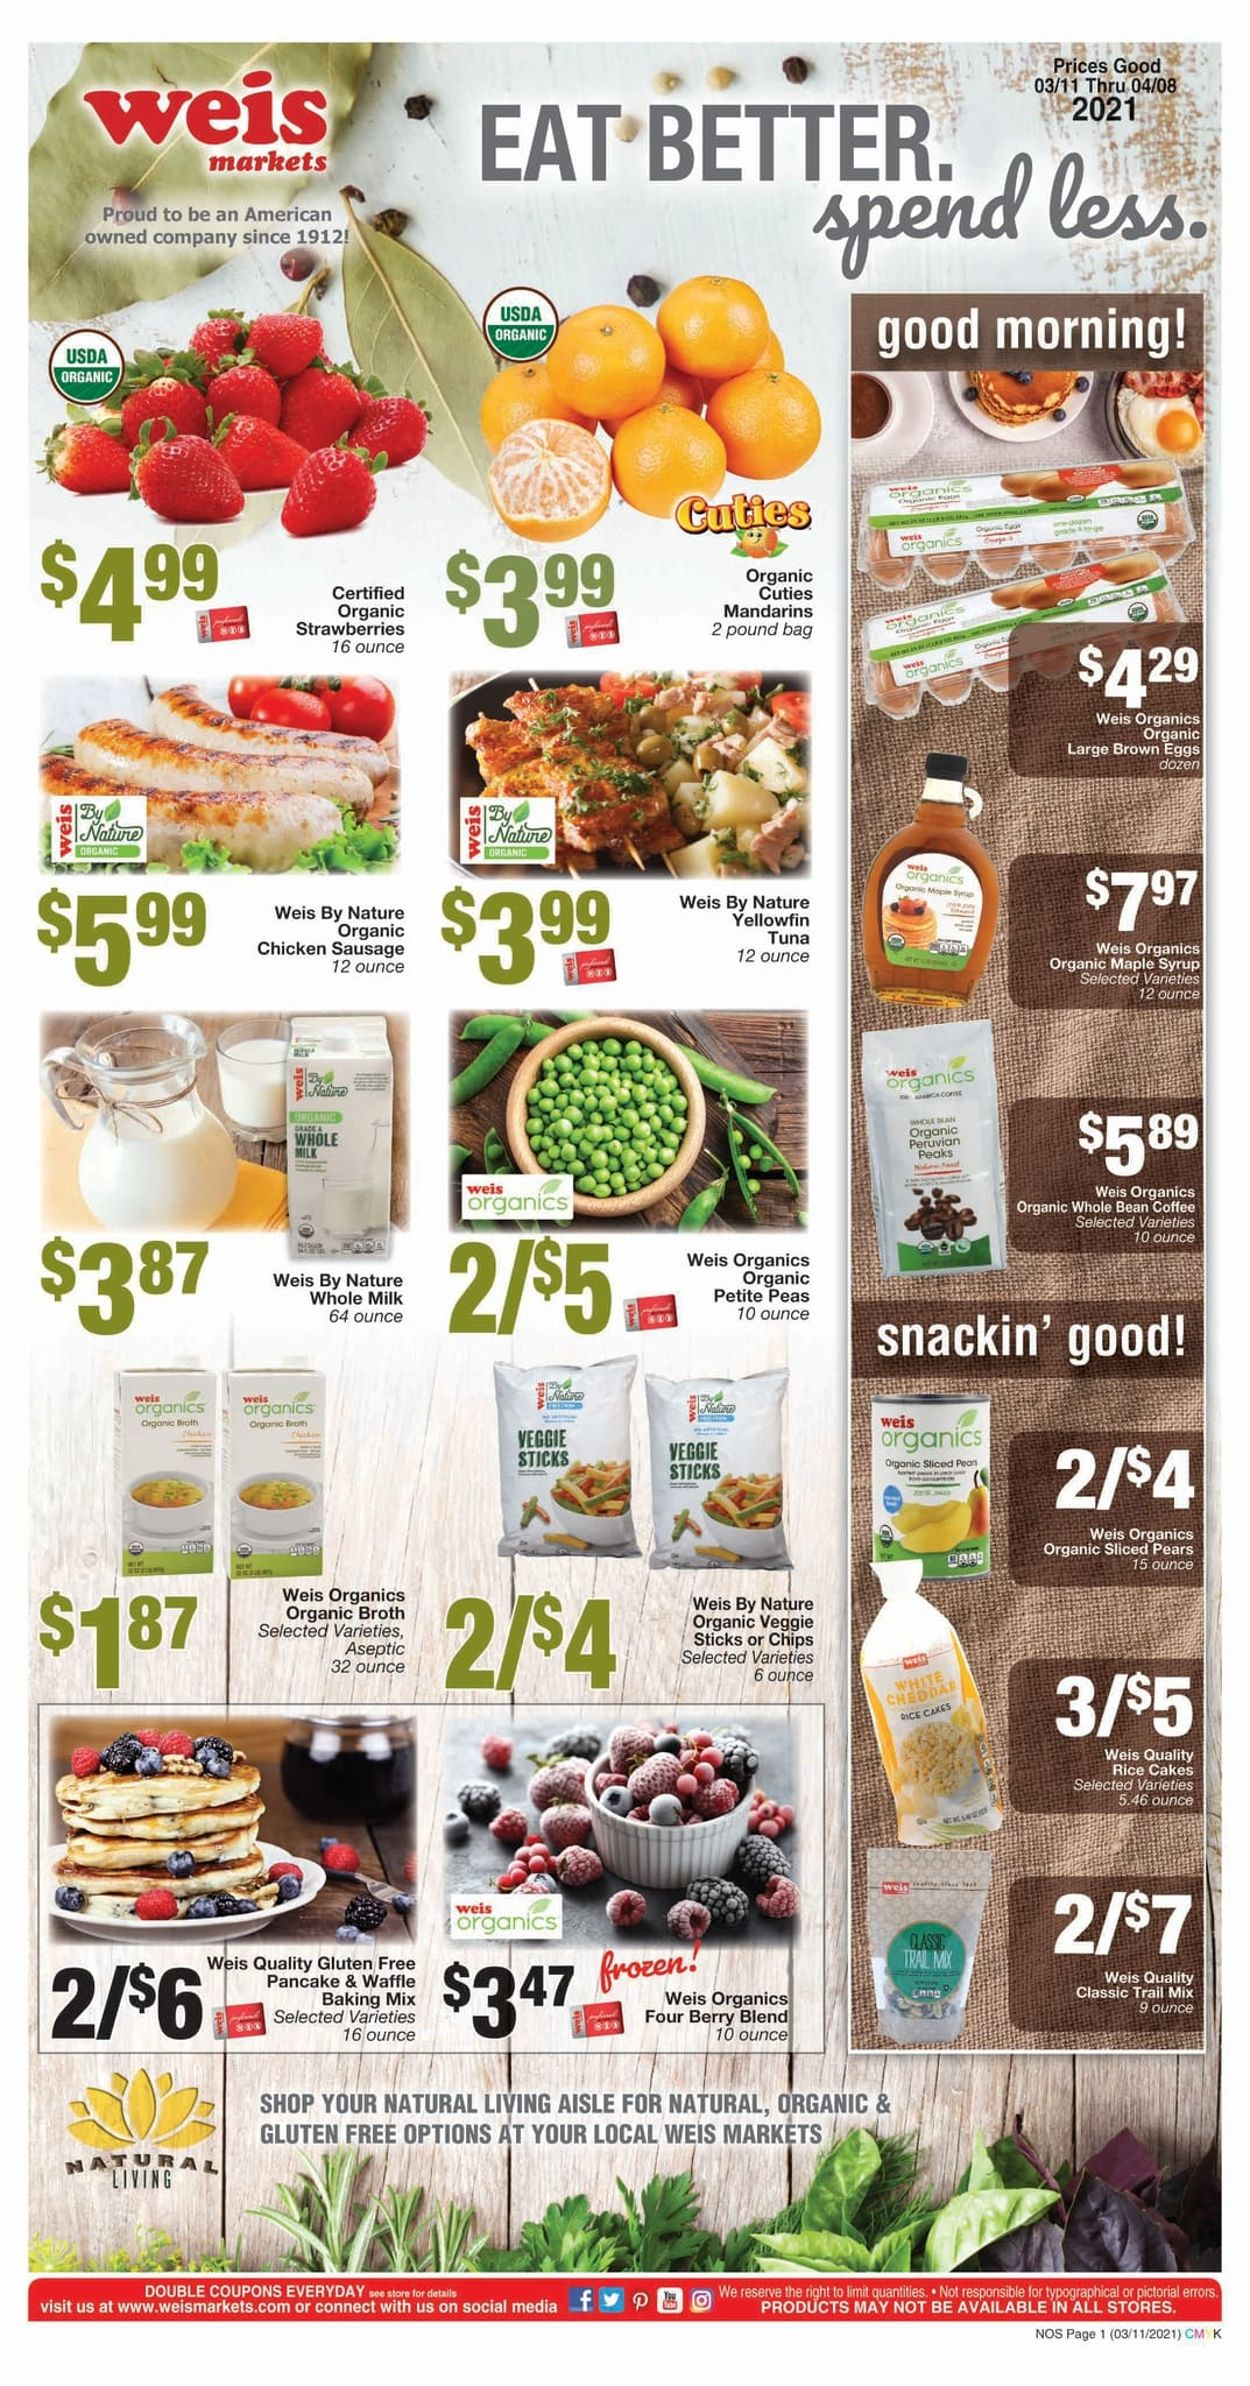 Weis Weekly Ad Circular - valid 03/11-04/08/2021